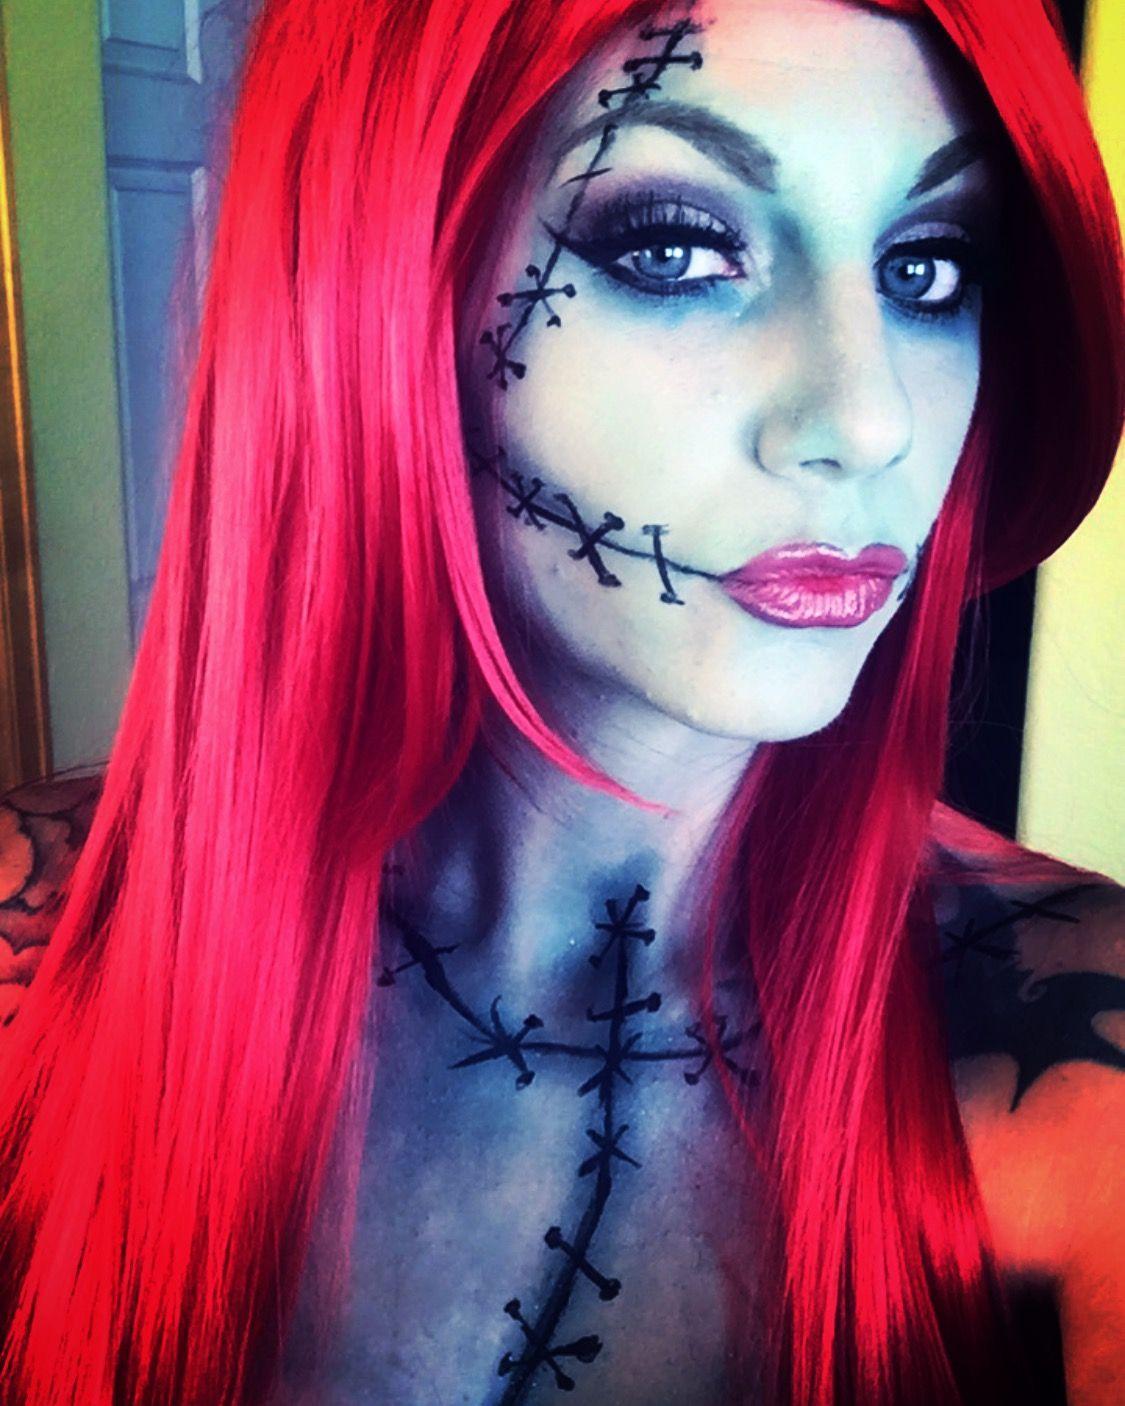 Sally rag doll makeup nightmare before Christmas instagram